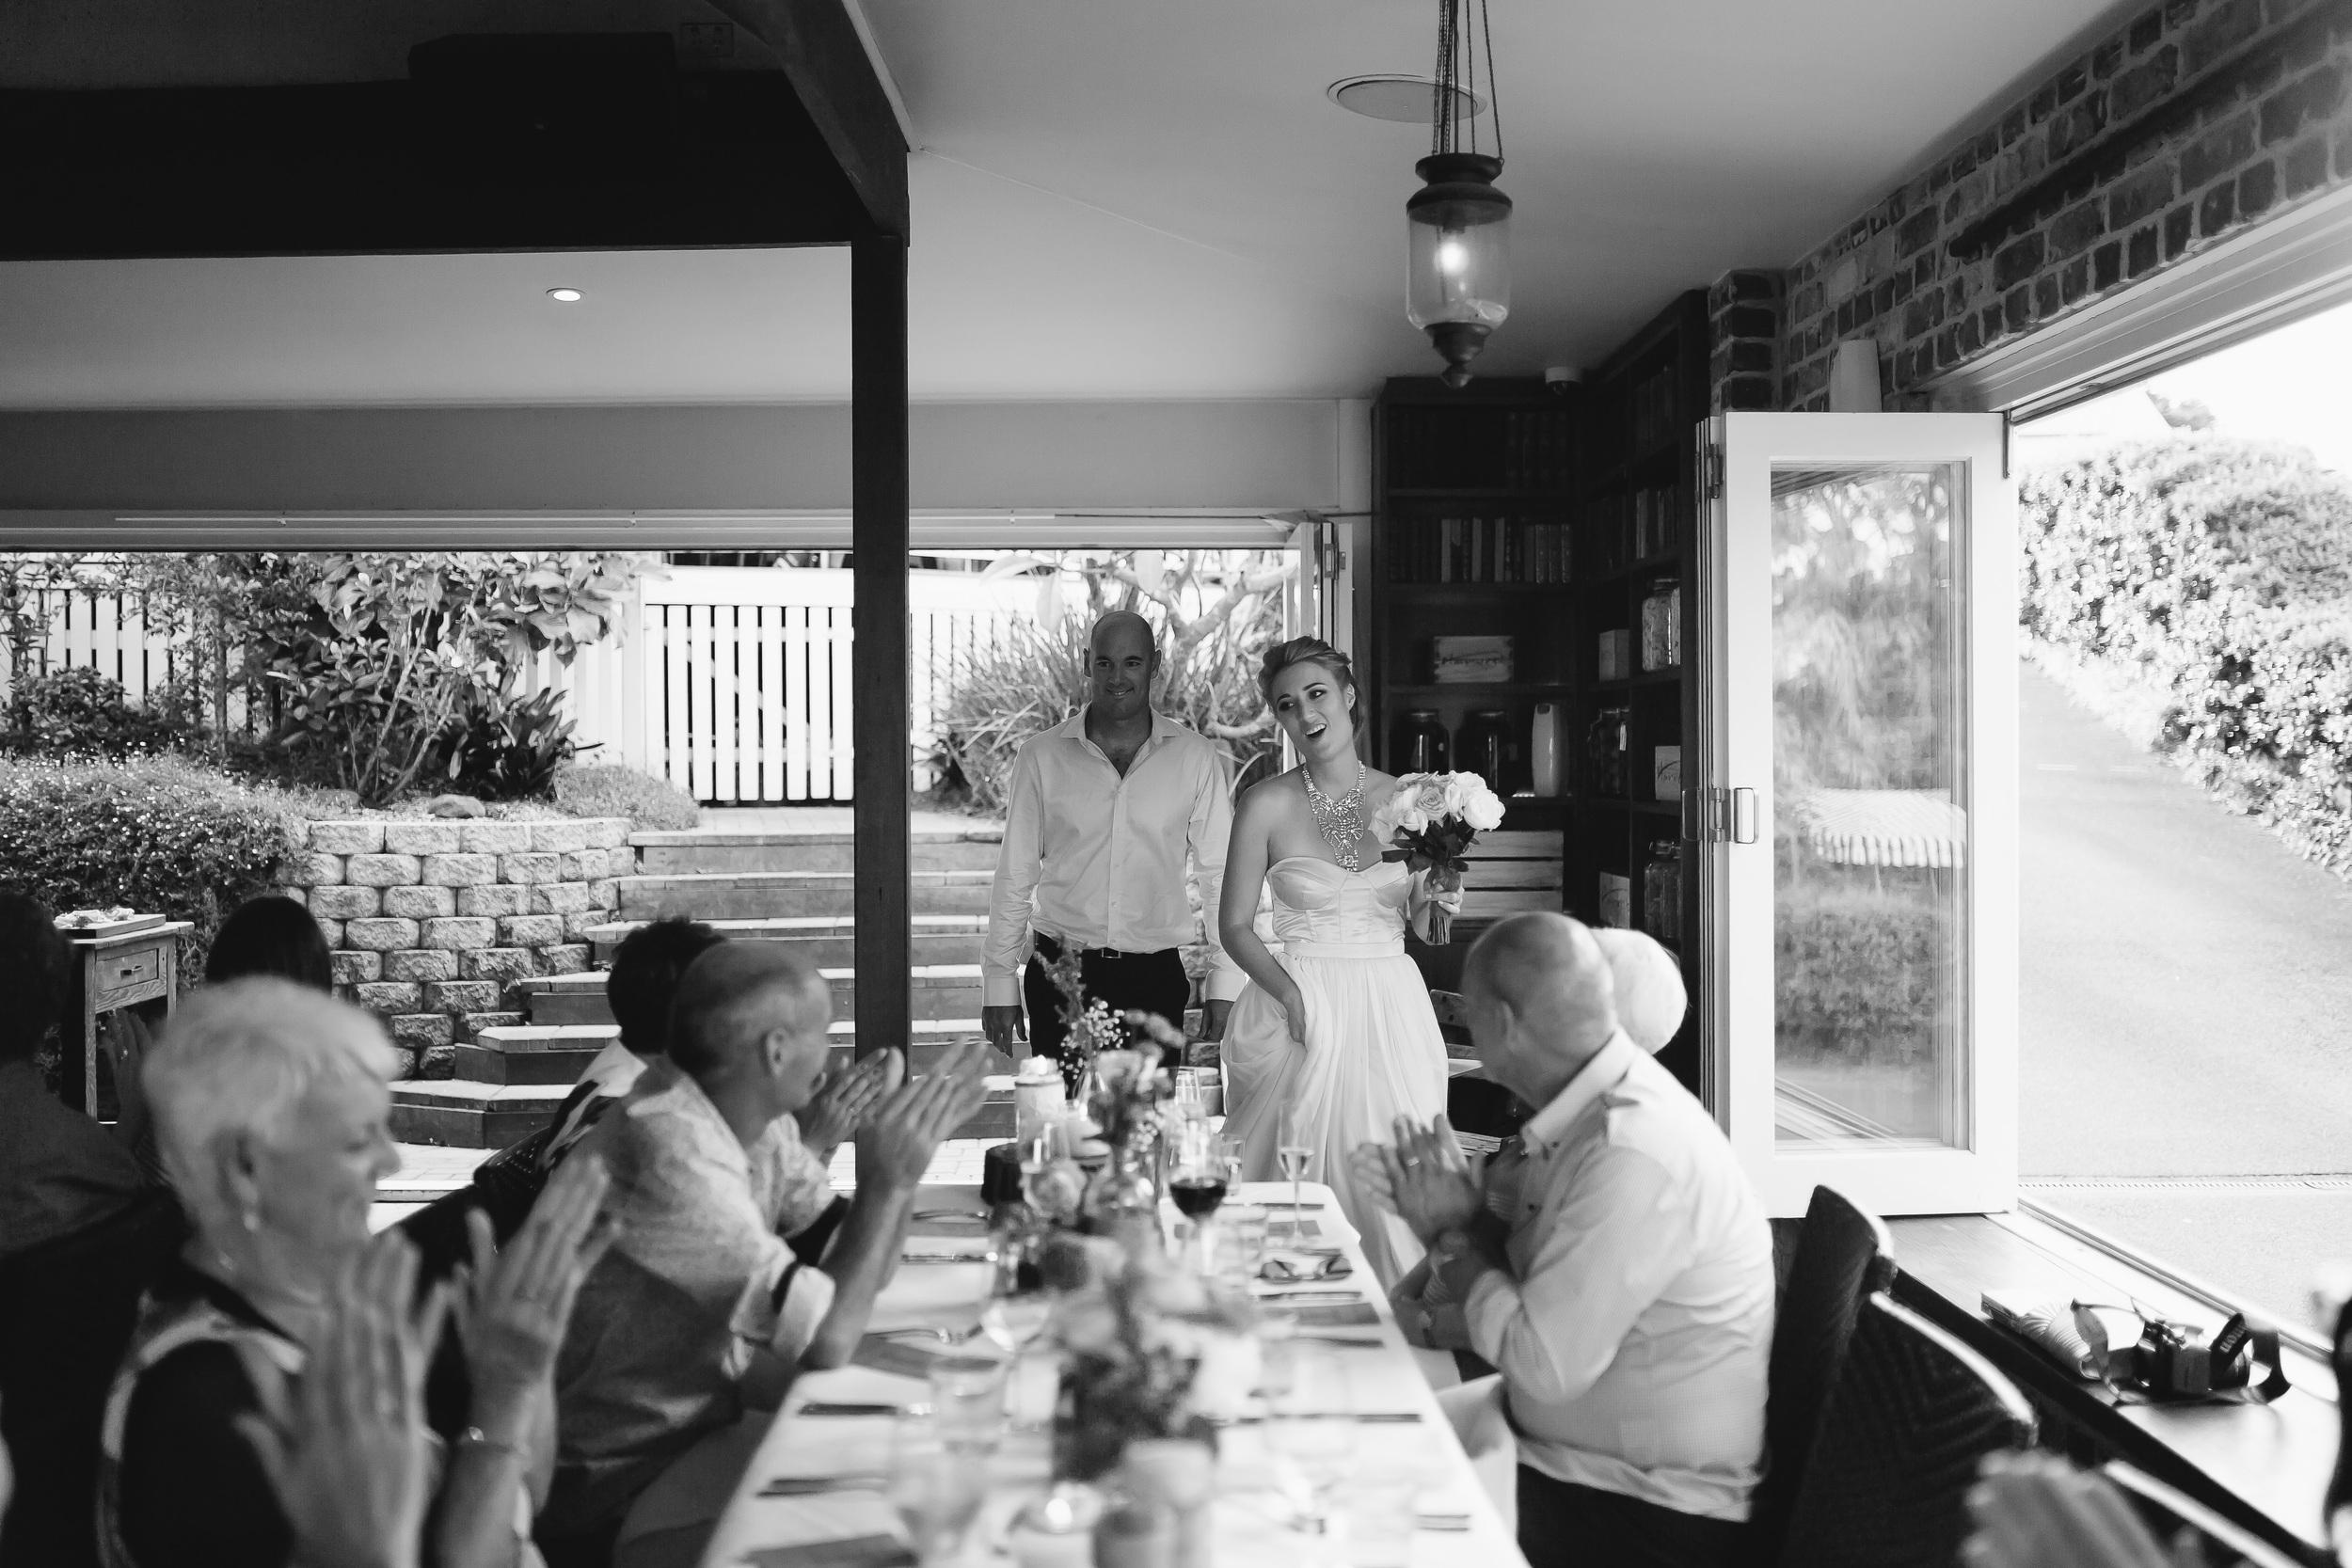 Byron Bay Wedding Harvest Cafe - Carly Tia Photography 038.jpg